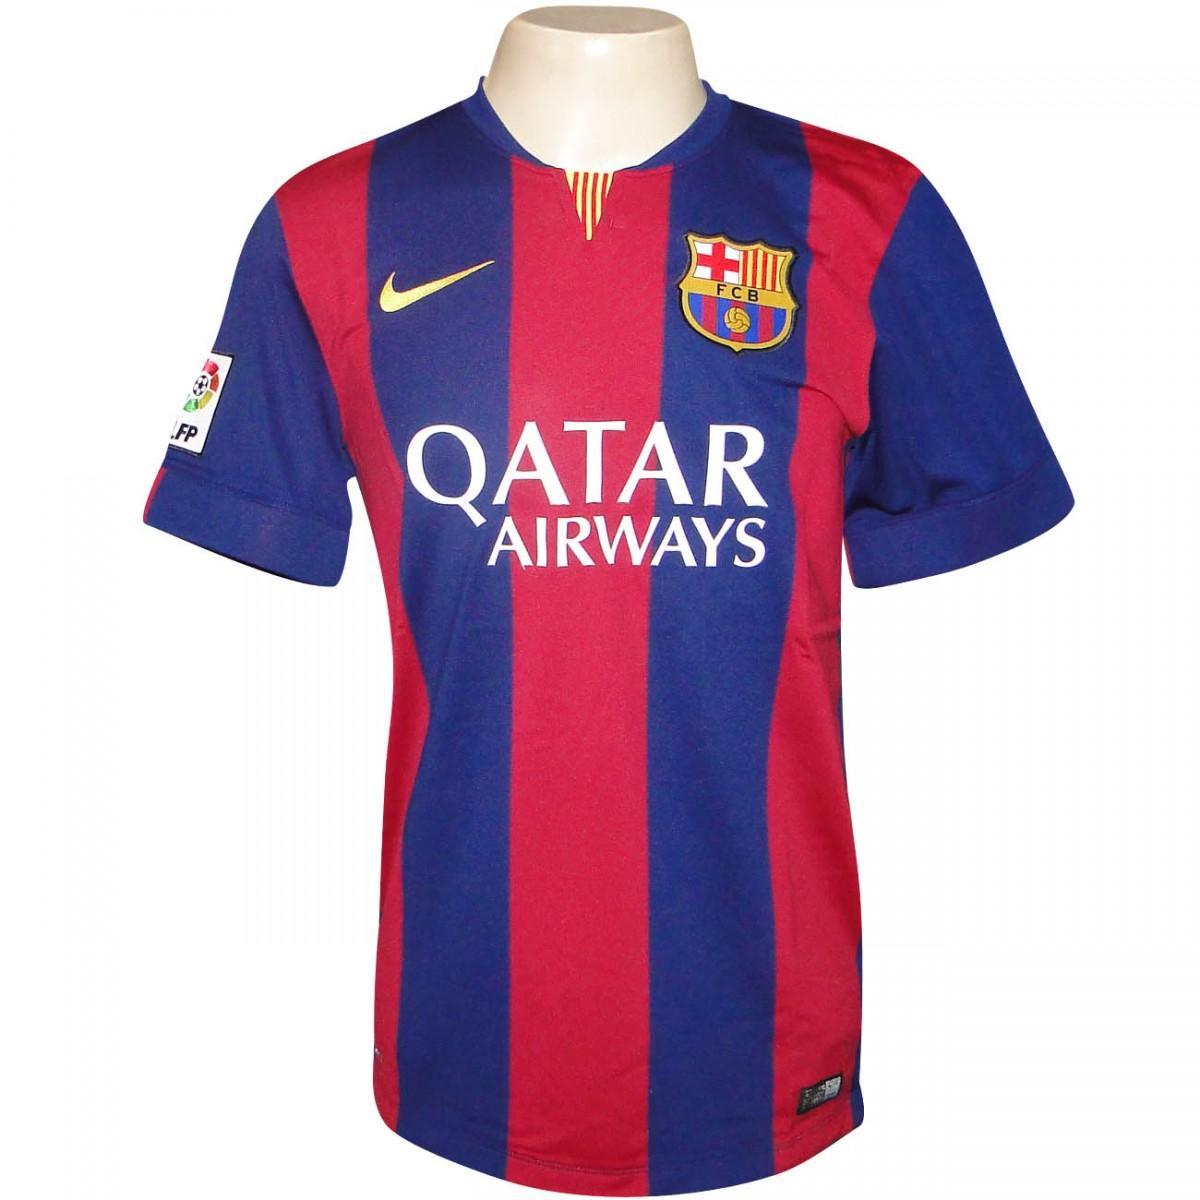 54500e97a3c9d Camisa Nike Barcelona 2014 2015 610594 422 - Marinho Bordo - Chuteira Nike